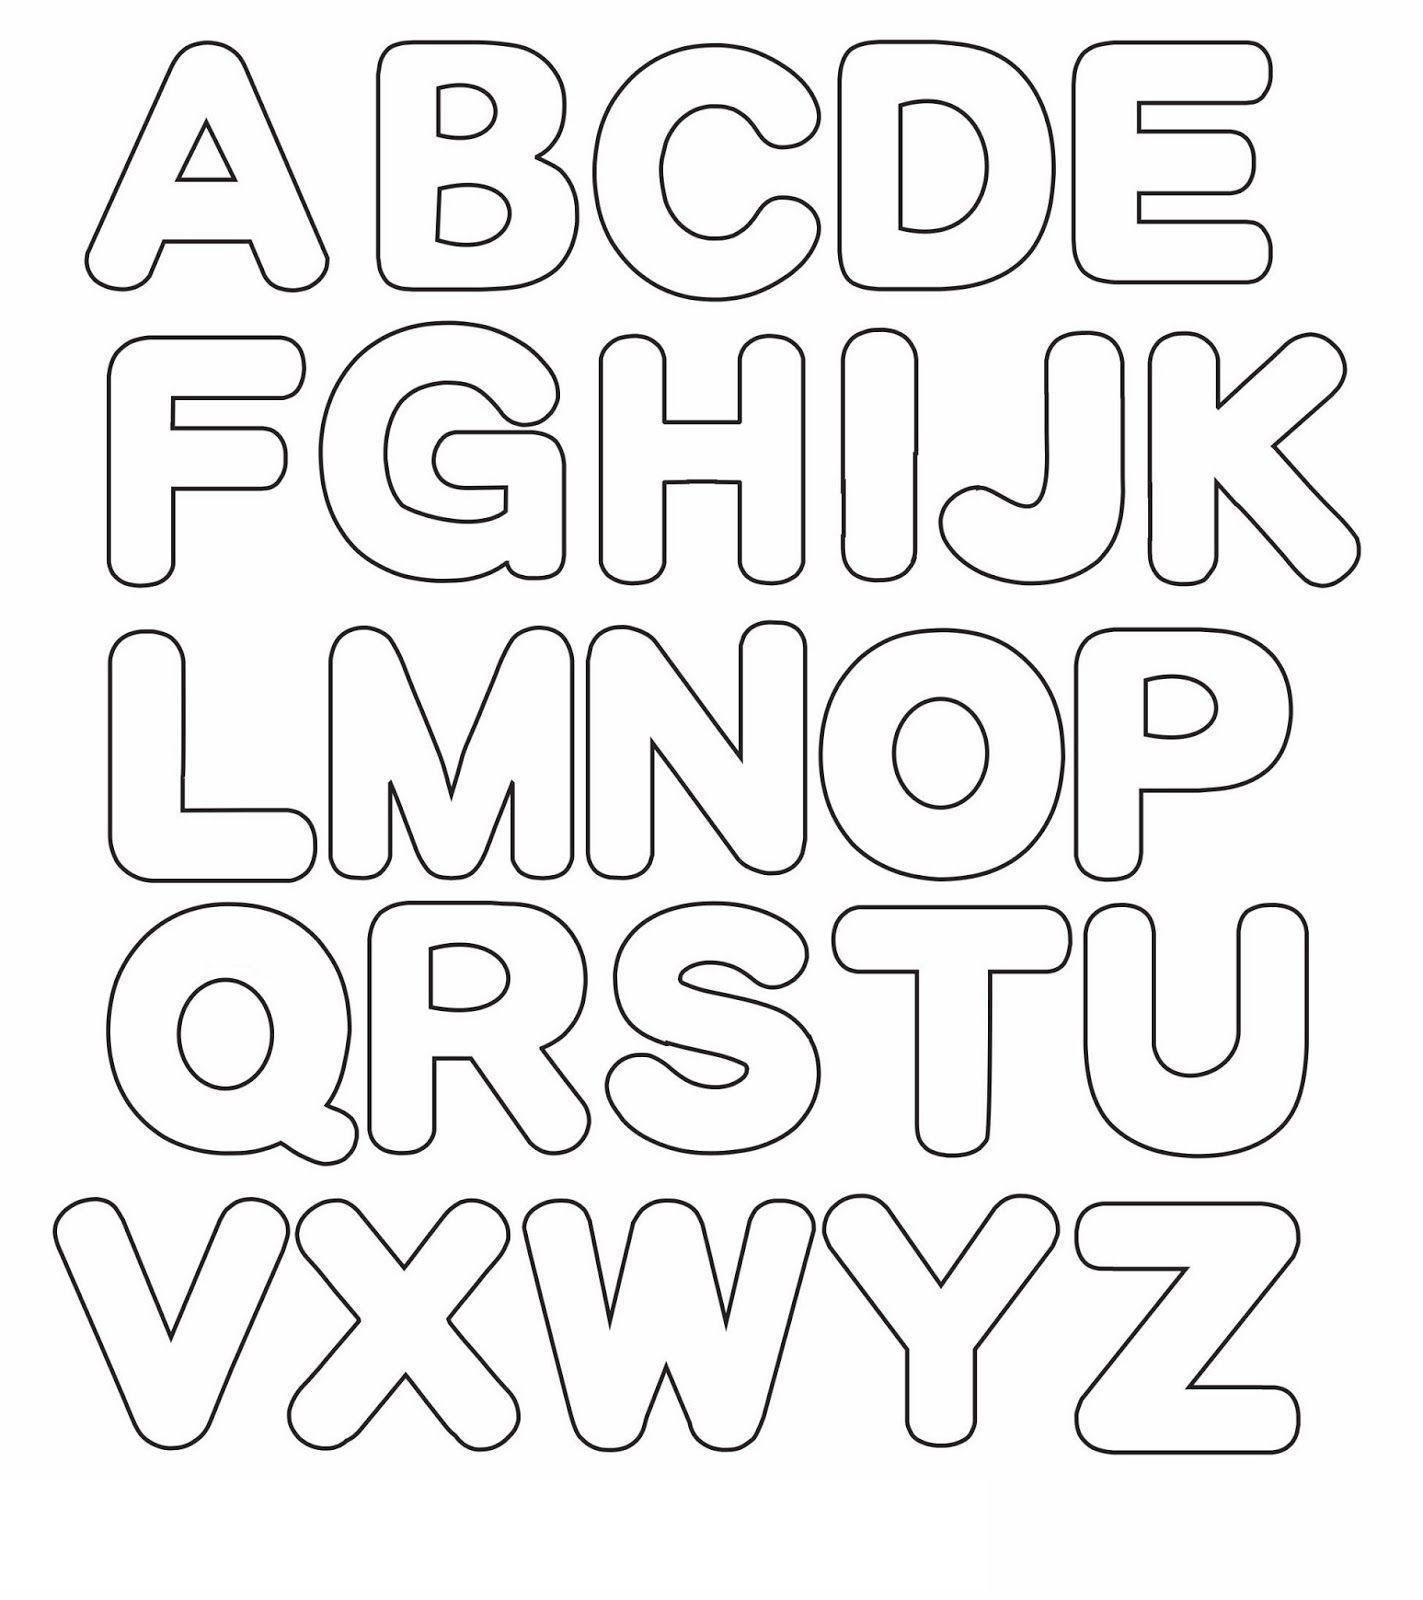 Alphabet Template Large To Print Alphabet templates